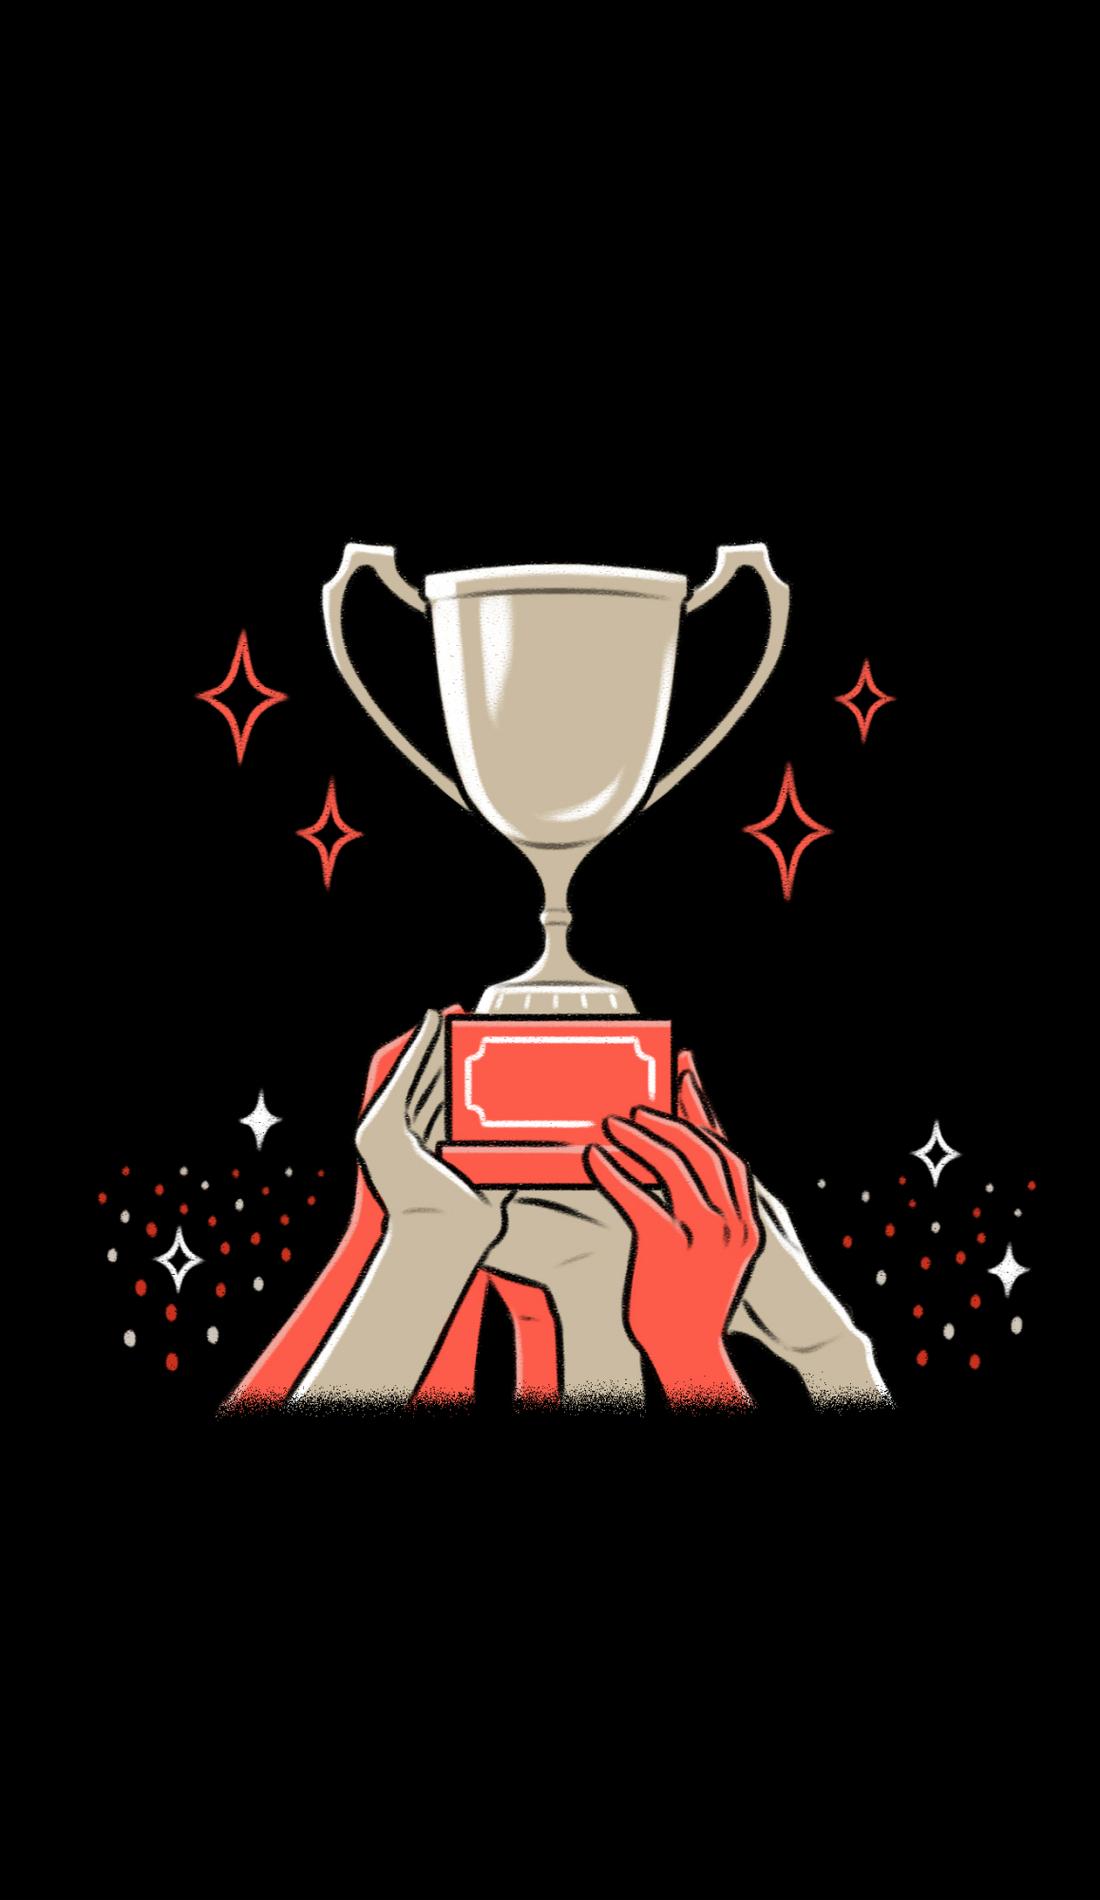 A CrossFit Games live event